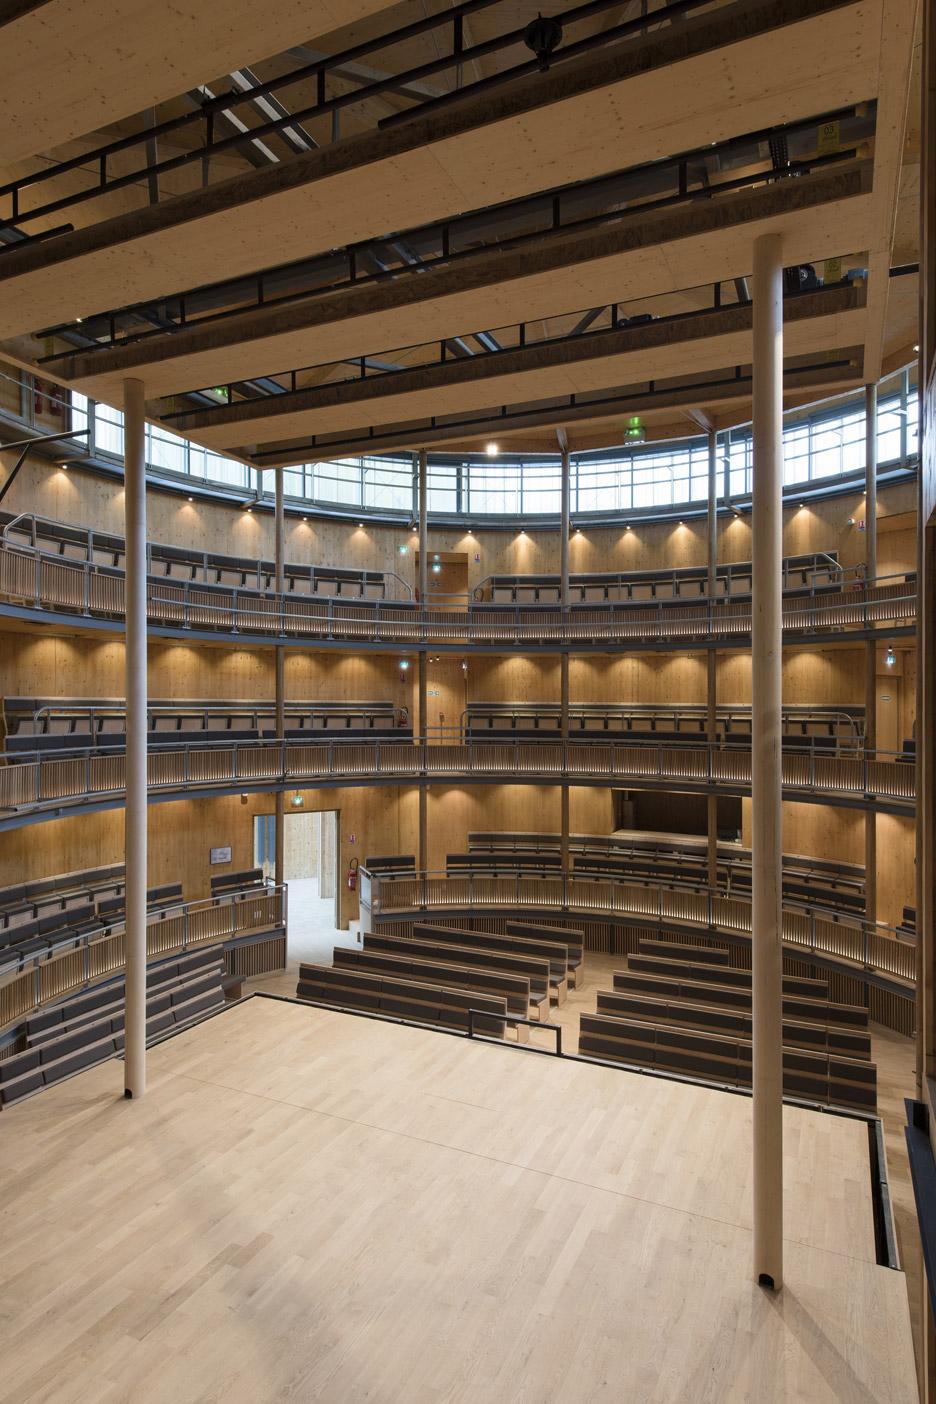 andrew-todd-theatre-pas-de-calais-globe-elizabethan-france-cross-laminated-timber_dezeen_936_15